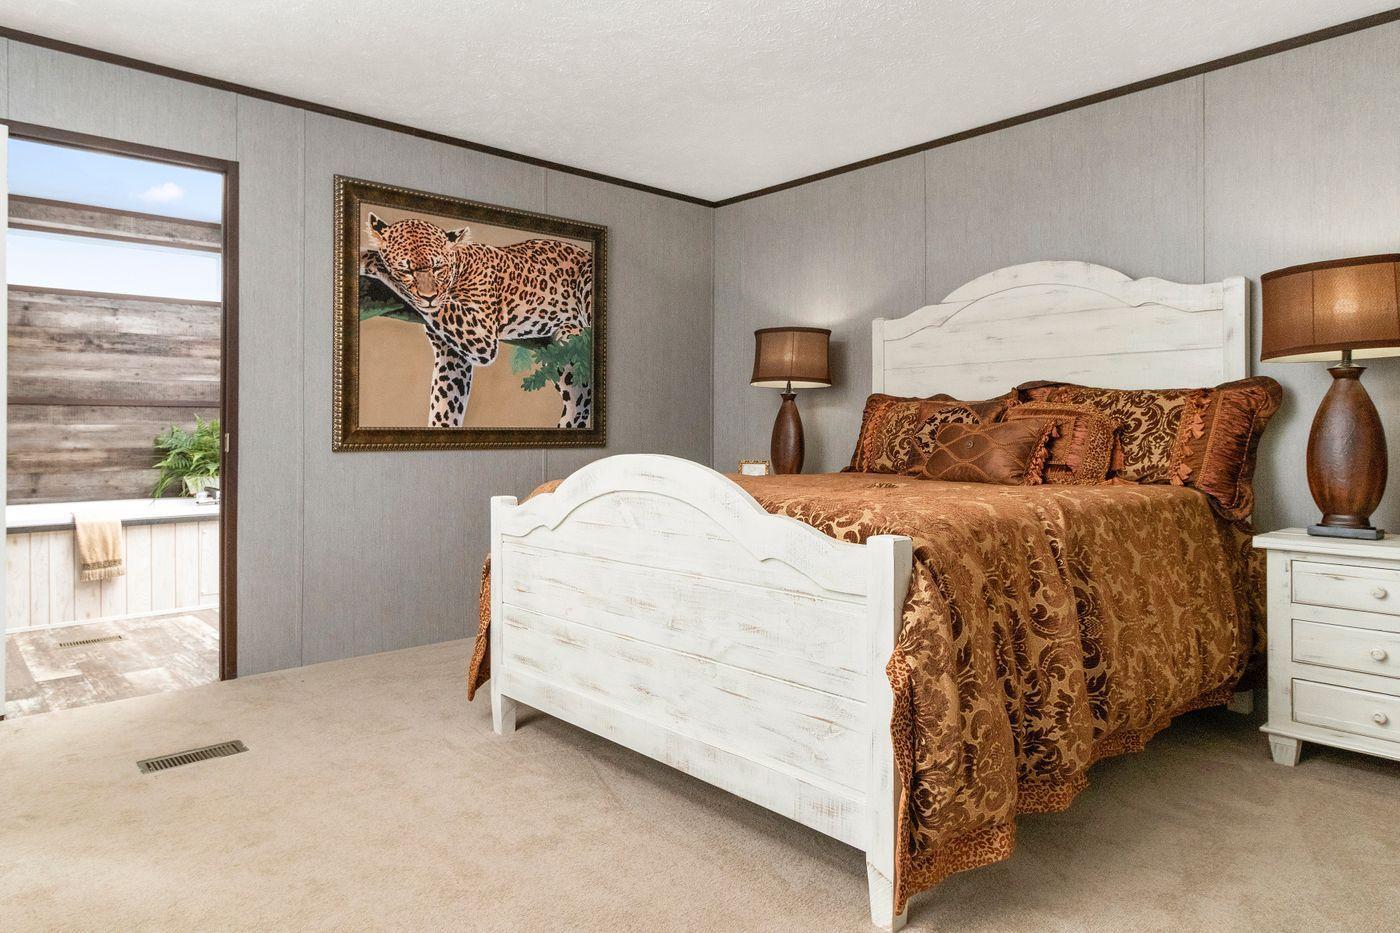 The Seaside Bedroom